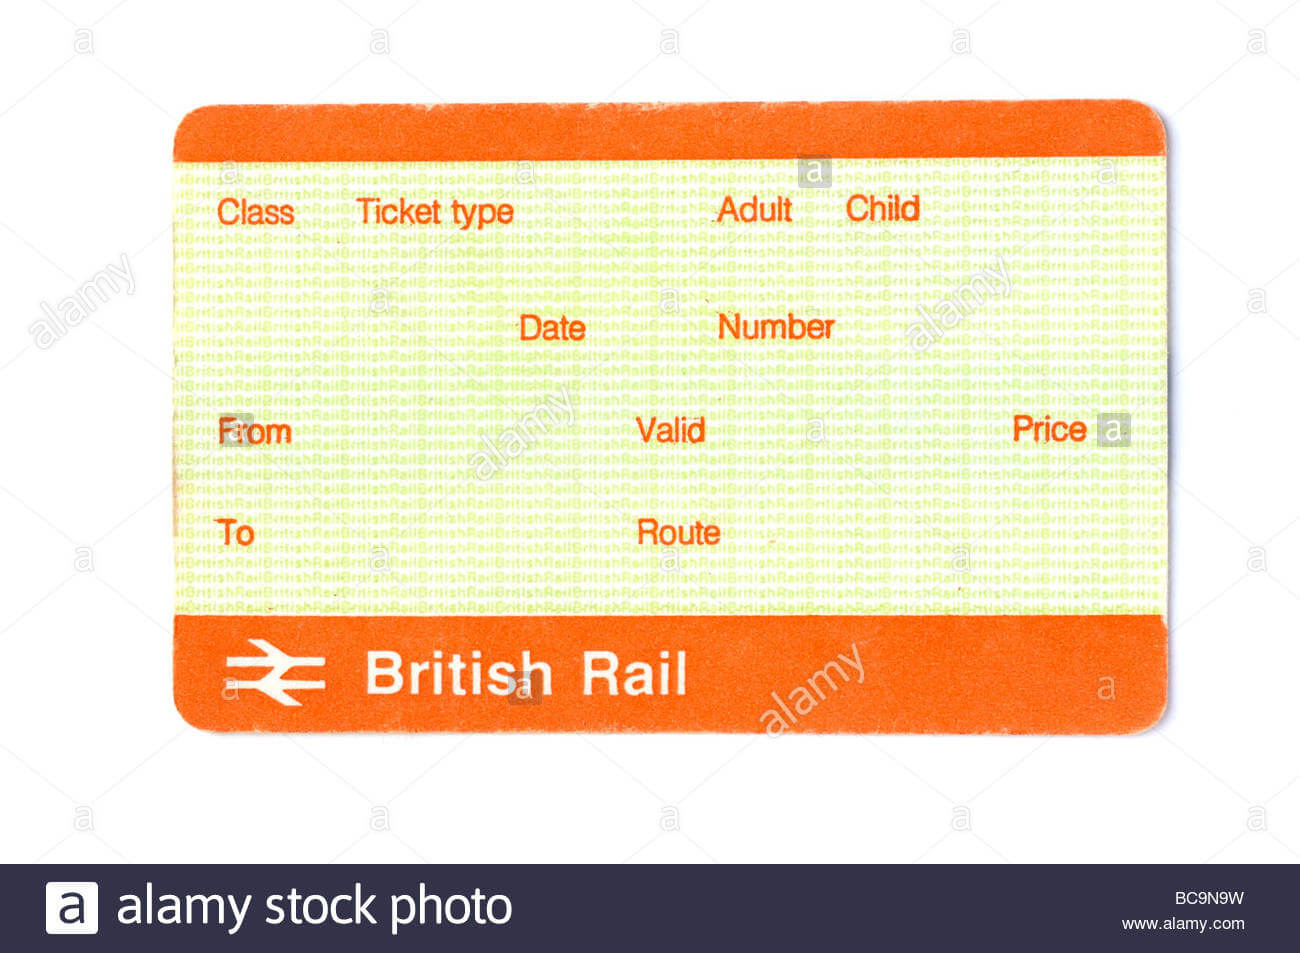 Train Ticket Blank Stock Photos & Train Ticket Blank Stock In Blank Train Ticket Template